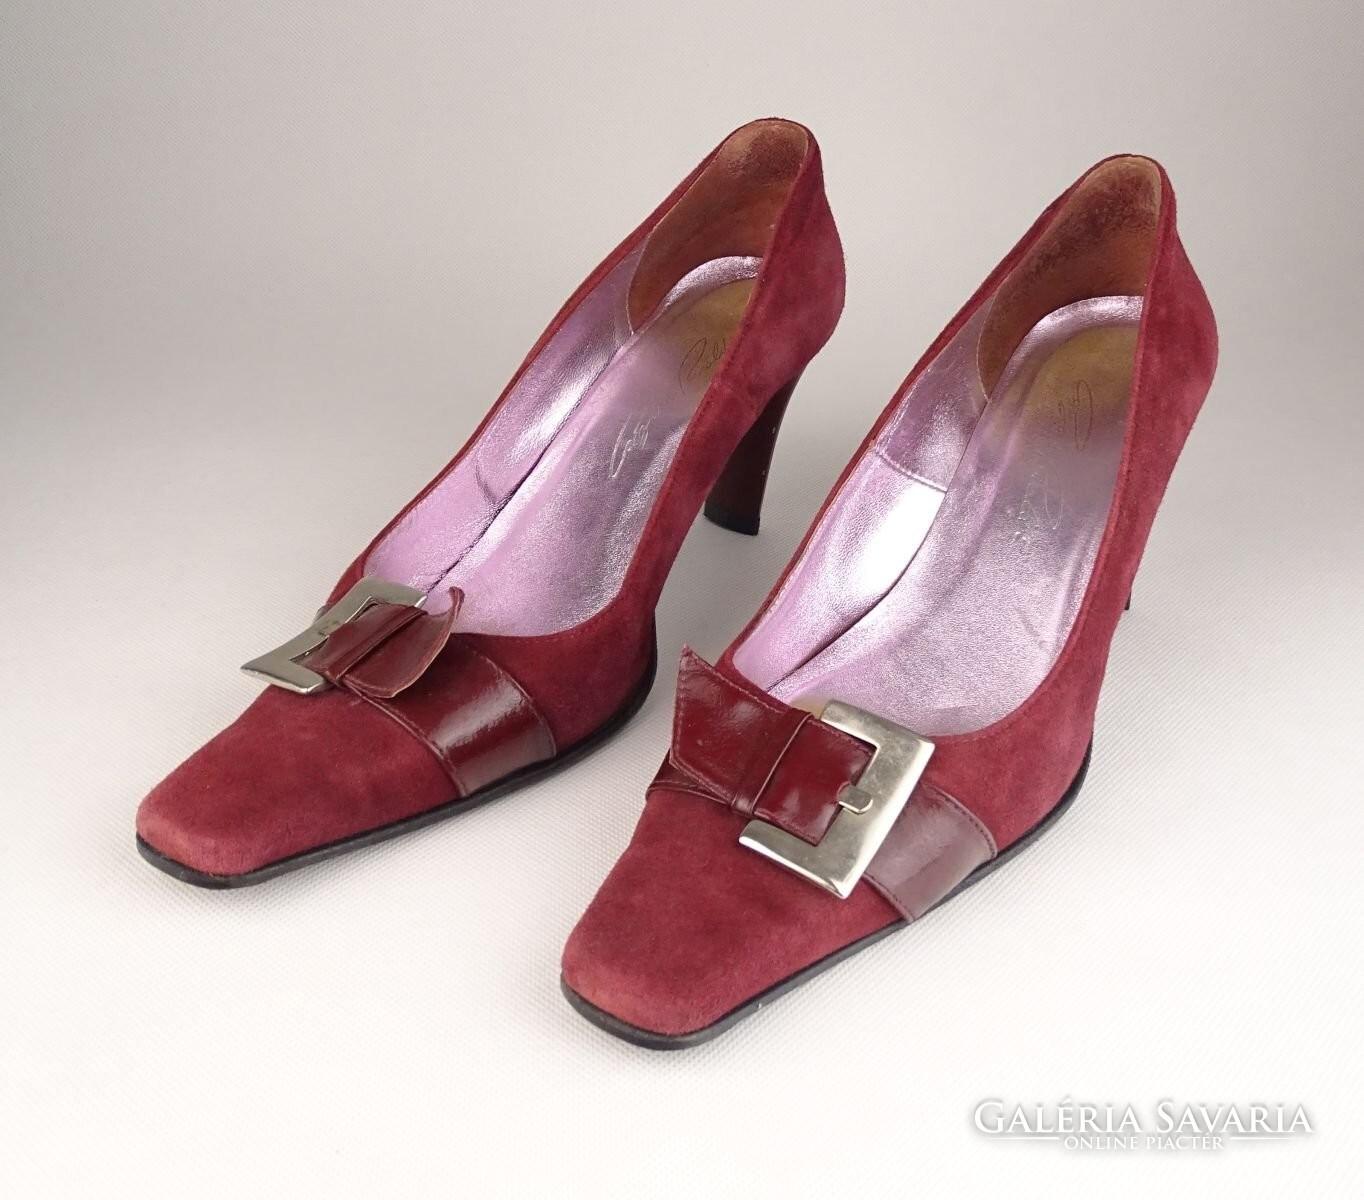 0V819 Bordó Cango Rinaldi női velúr cipő 38-as - Gardrób  9f86b88343